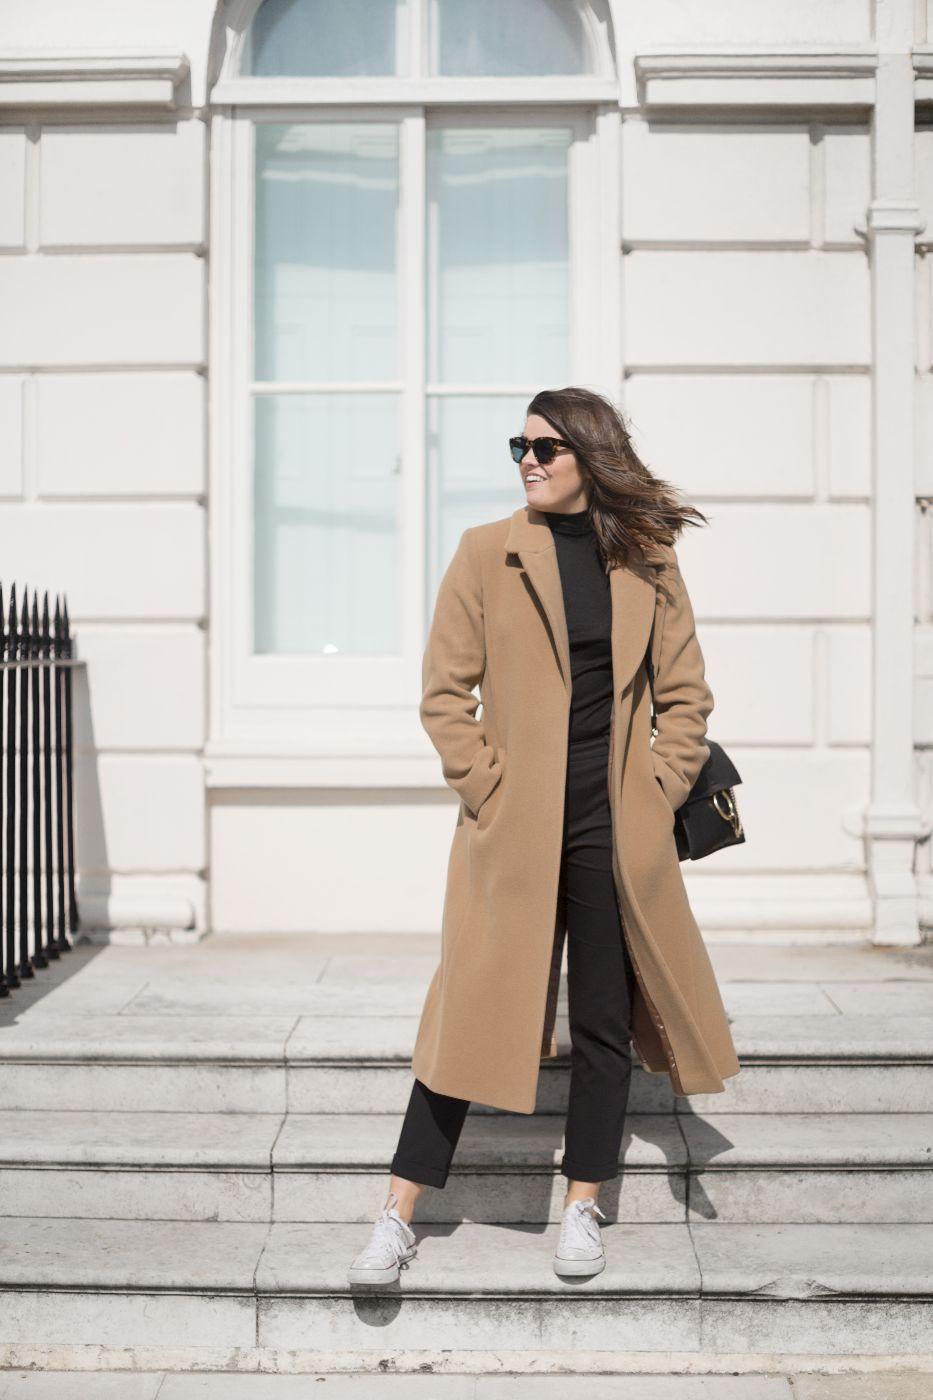 theannaedit-new-autumn-winter-coat-whistles-fashion-september-2017-13